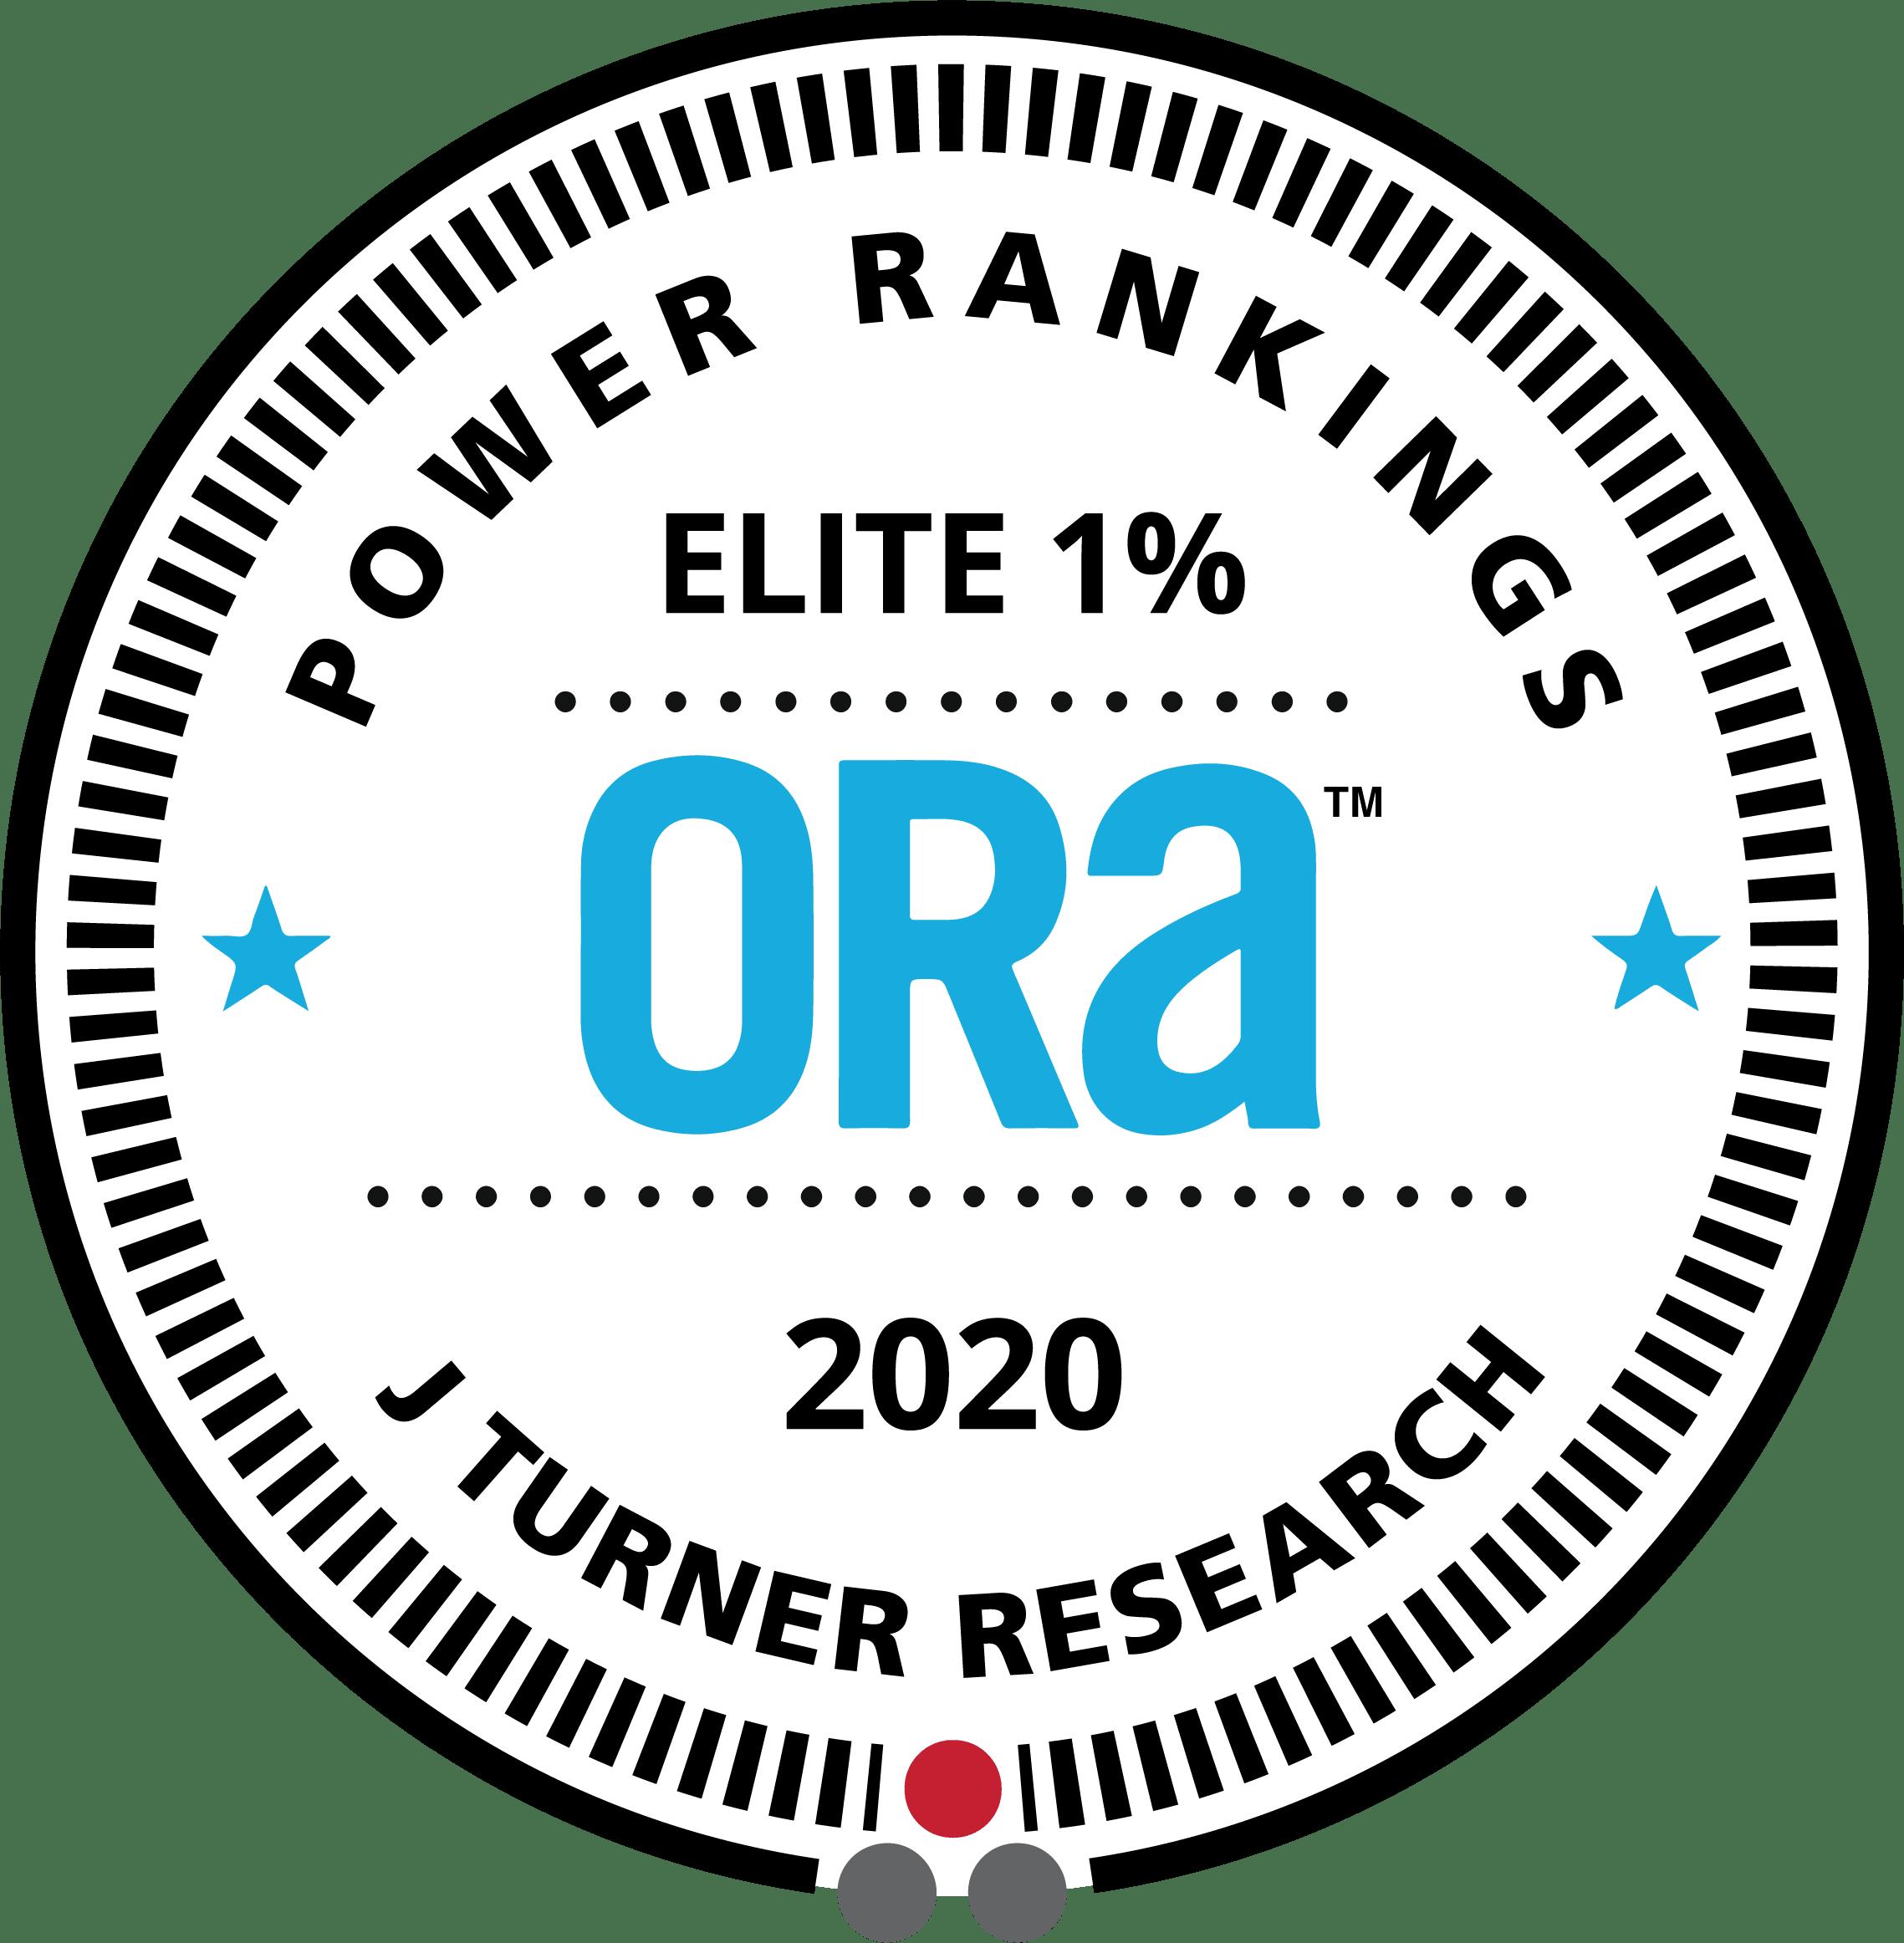 Elite 1% badge